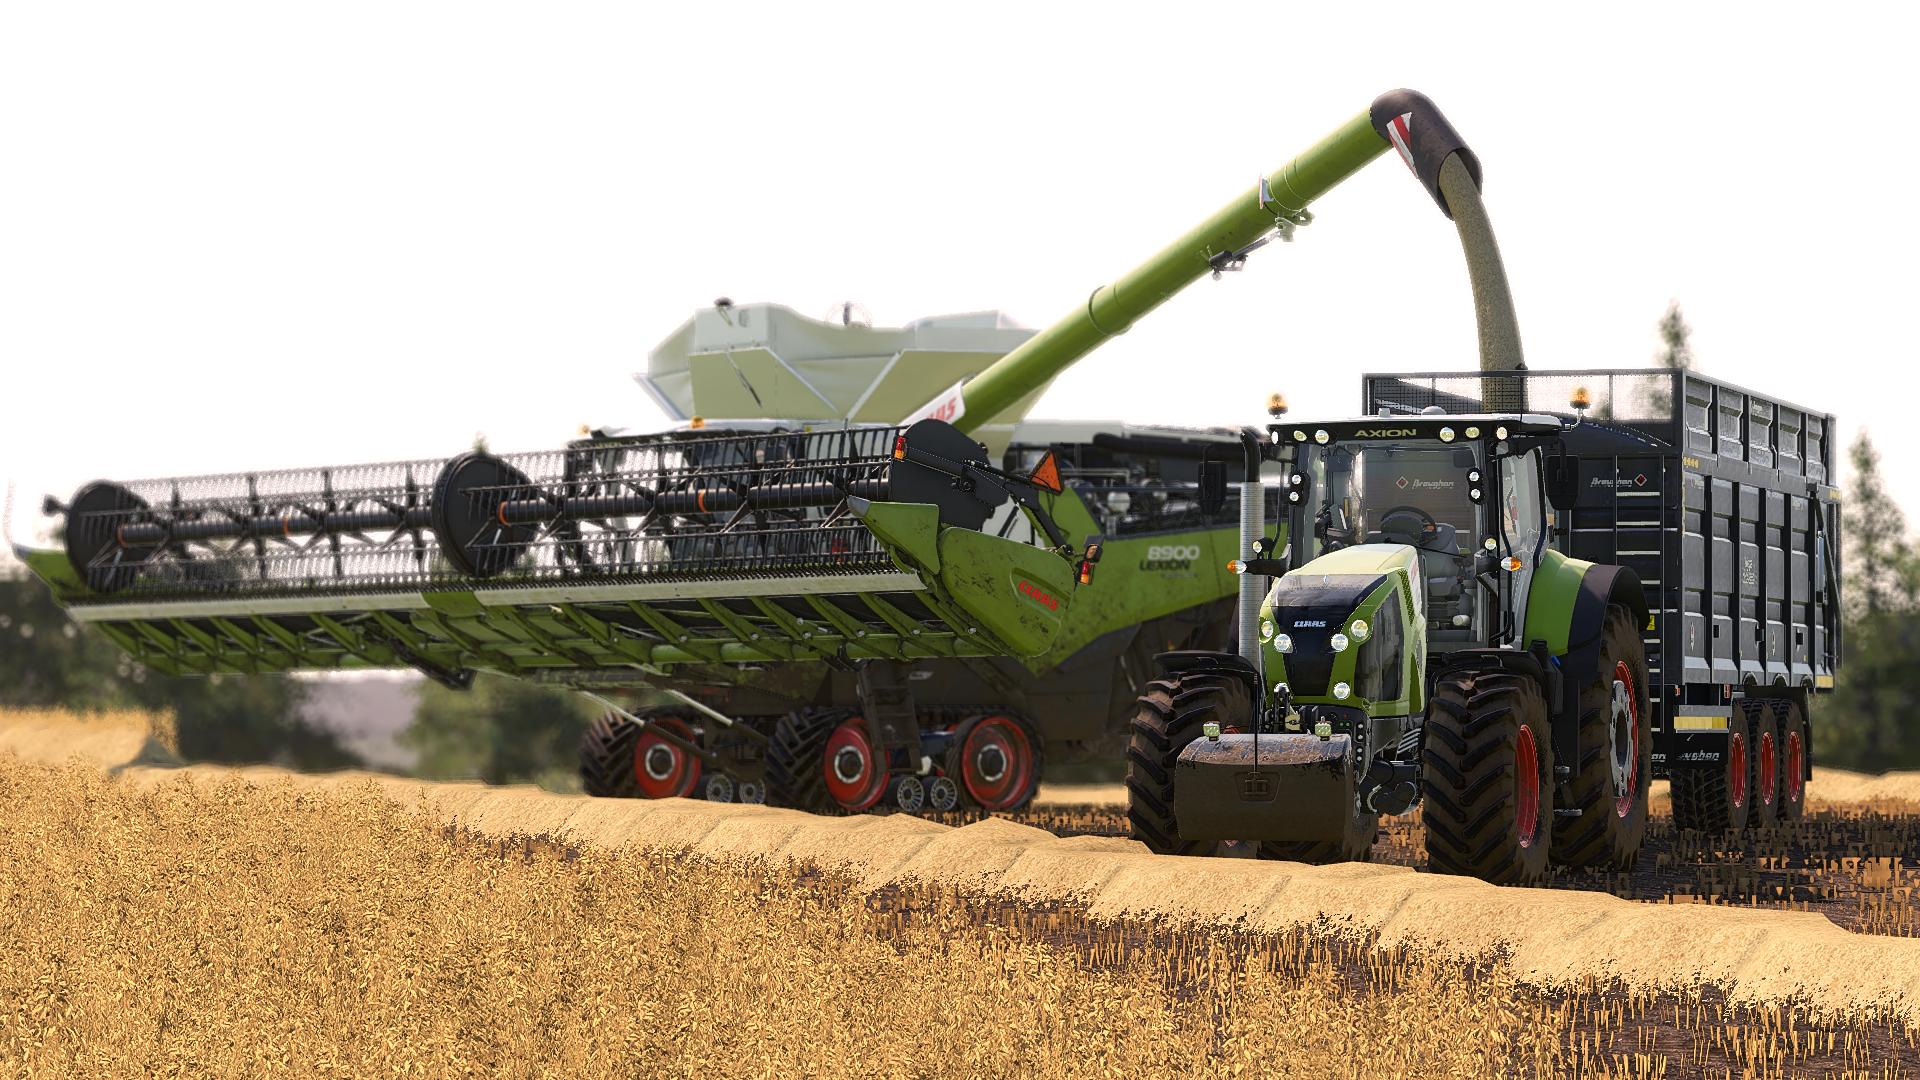 General 1920x1080 fs19 farming farm tractors Harvest nature farming simulator